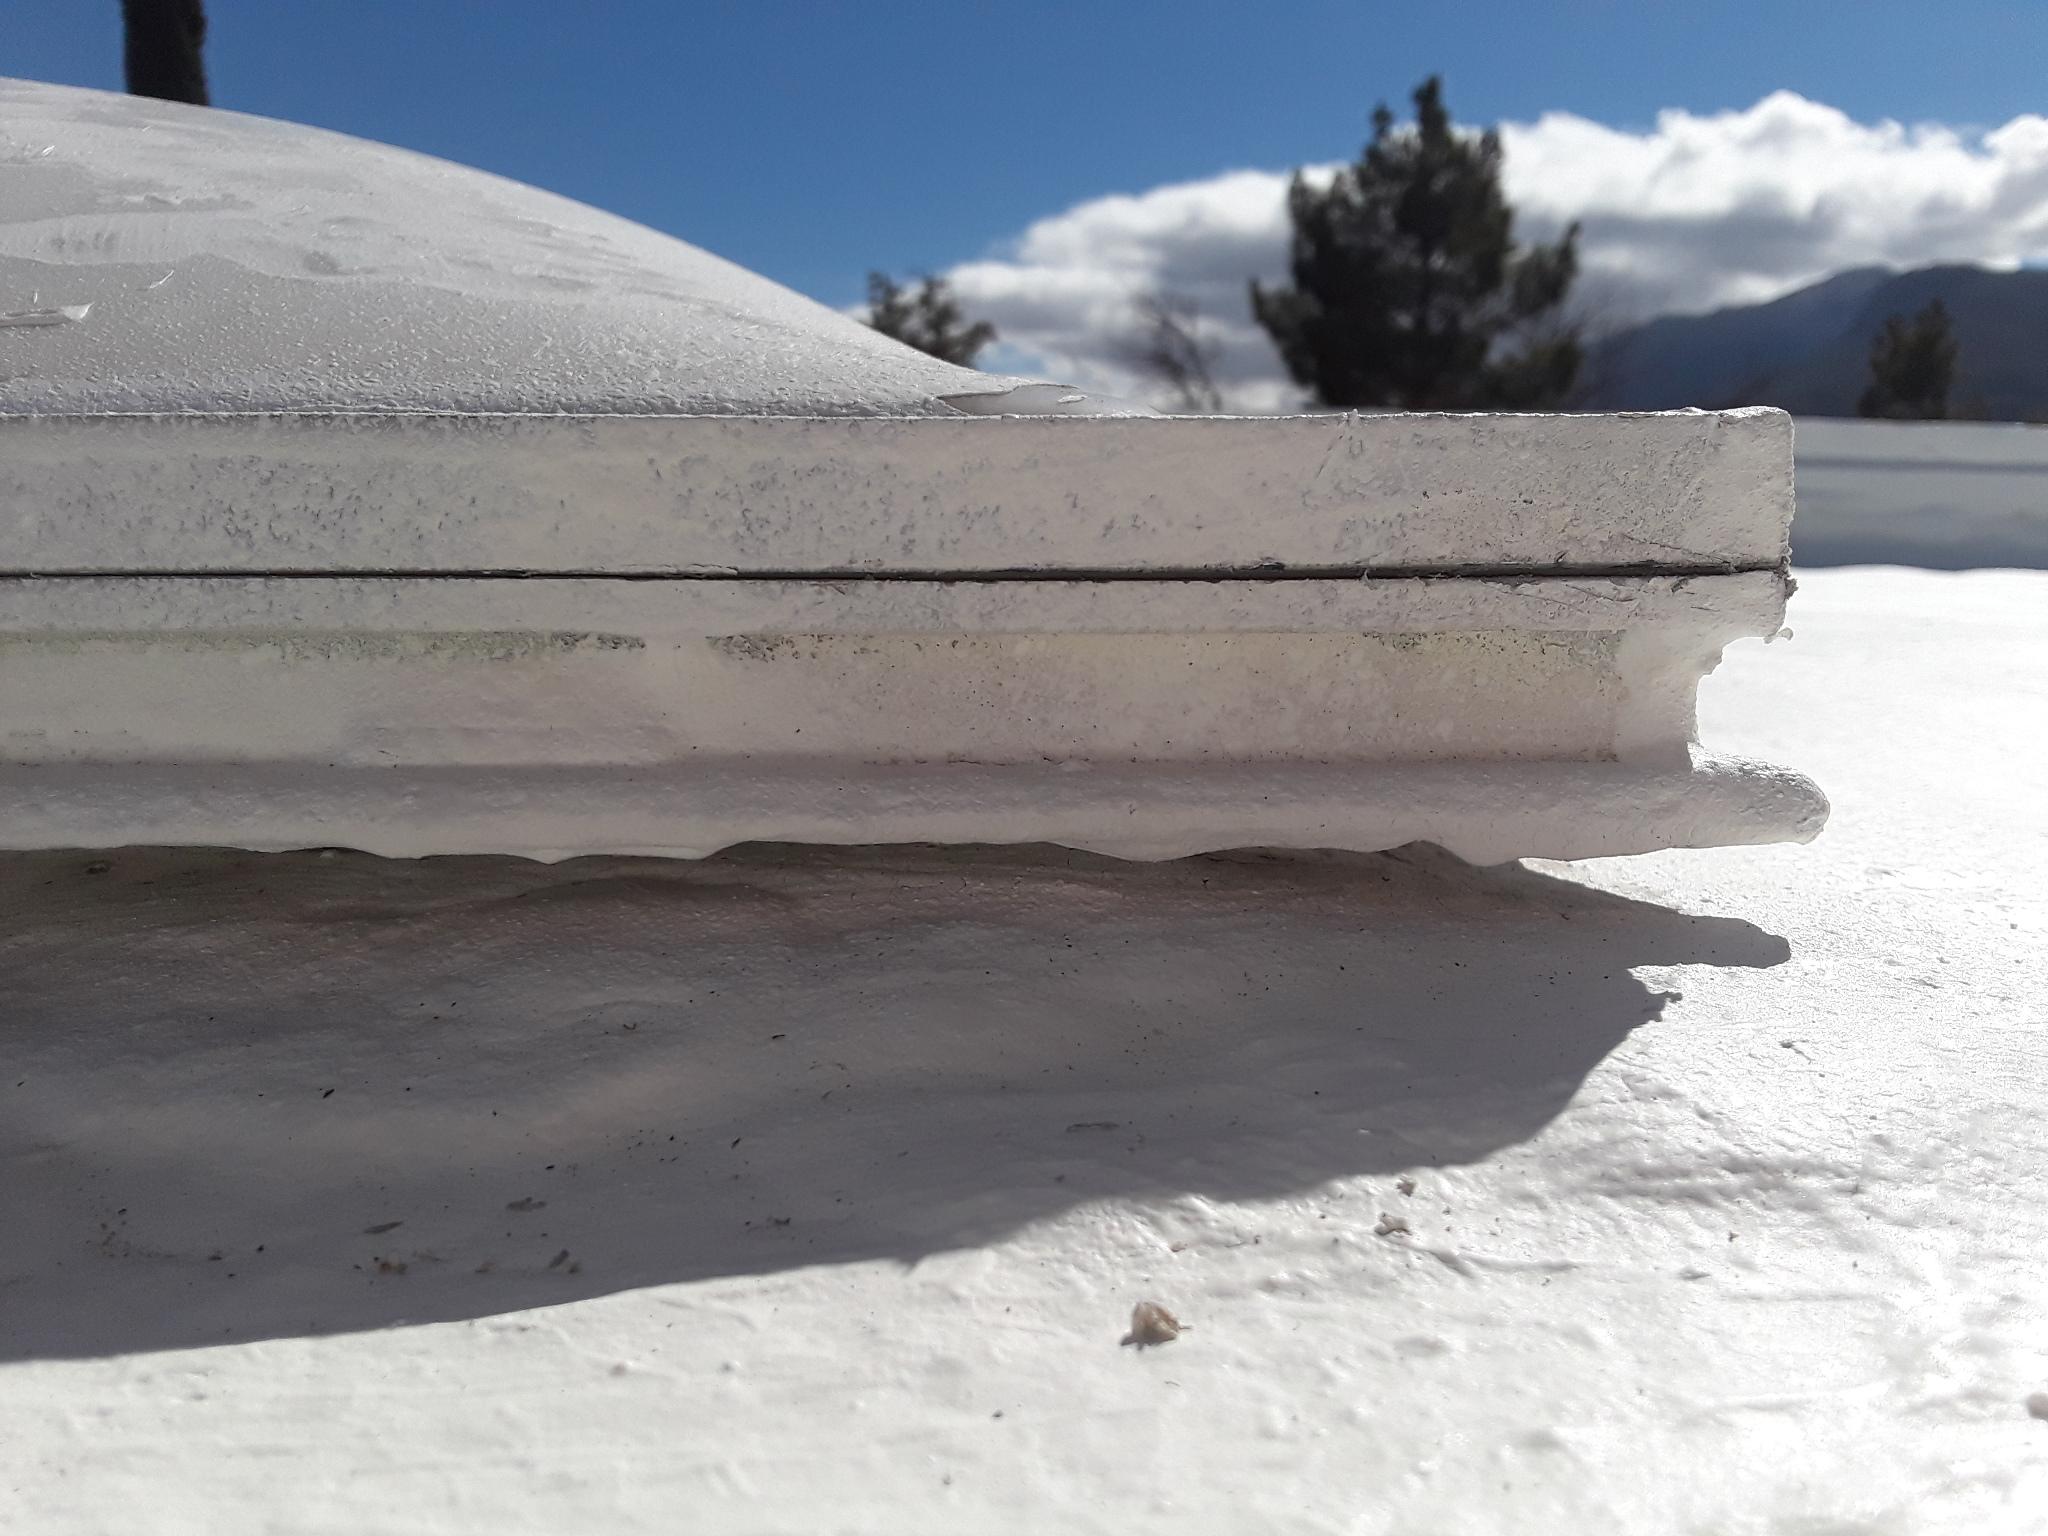 Old Skylight Dome Change, No Screws?-sky3.jpg